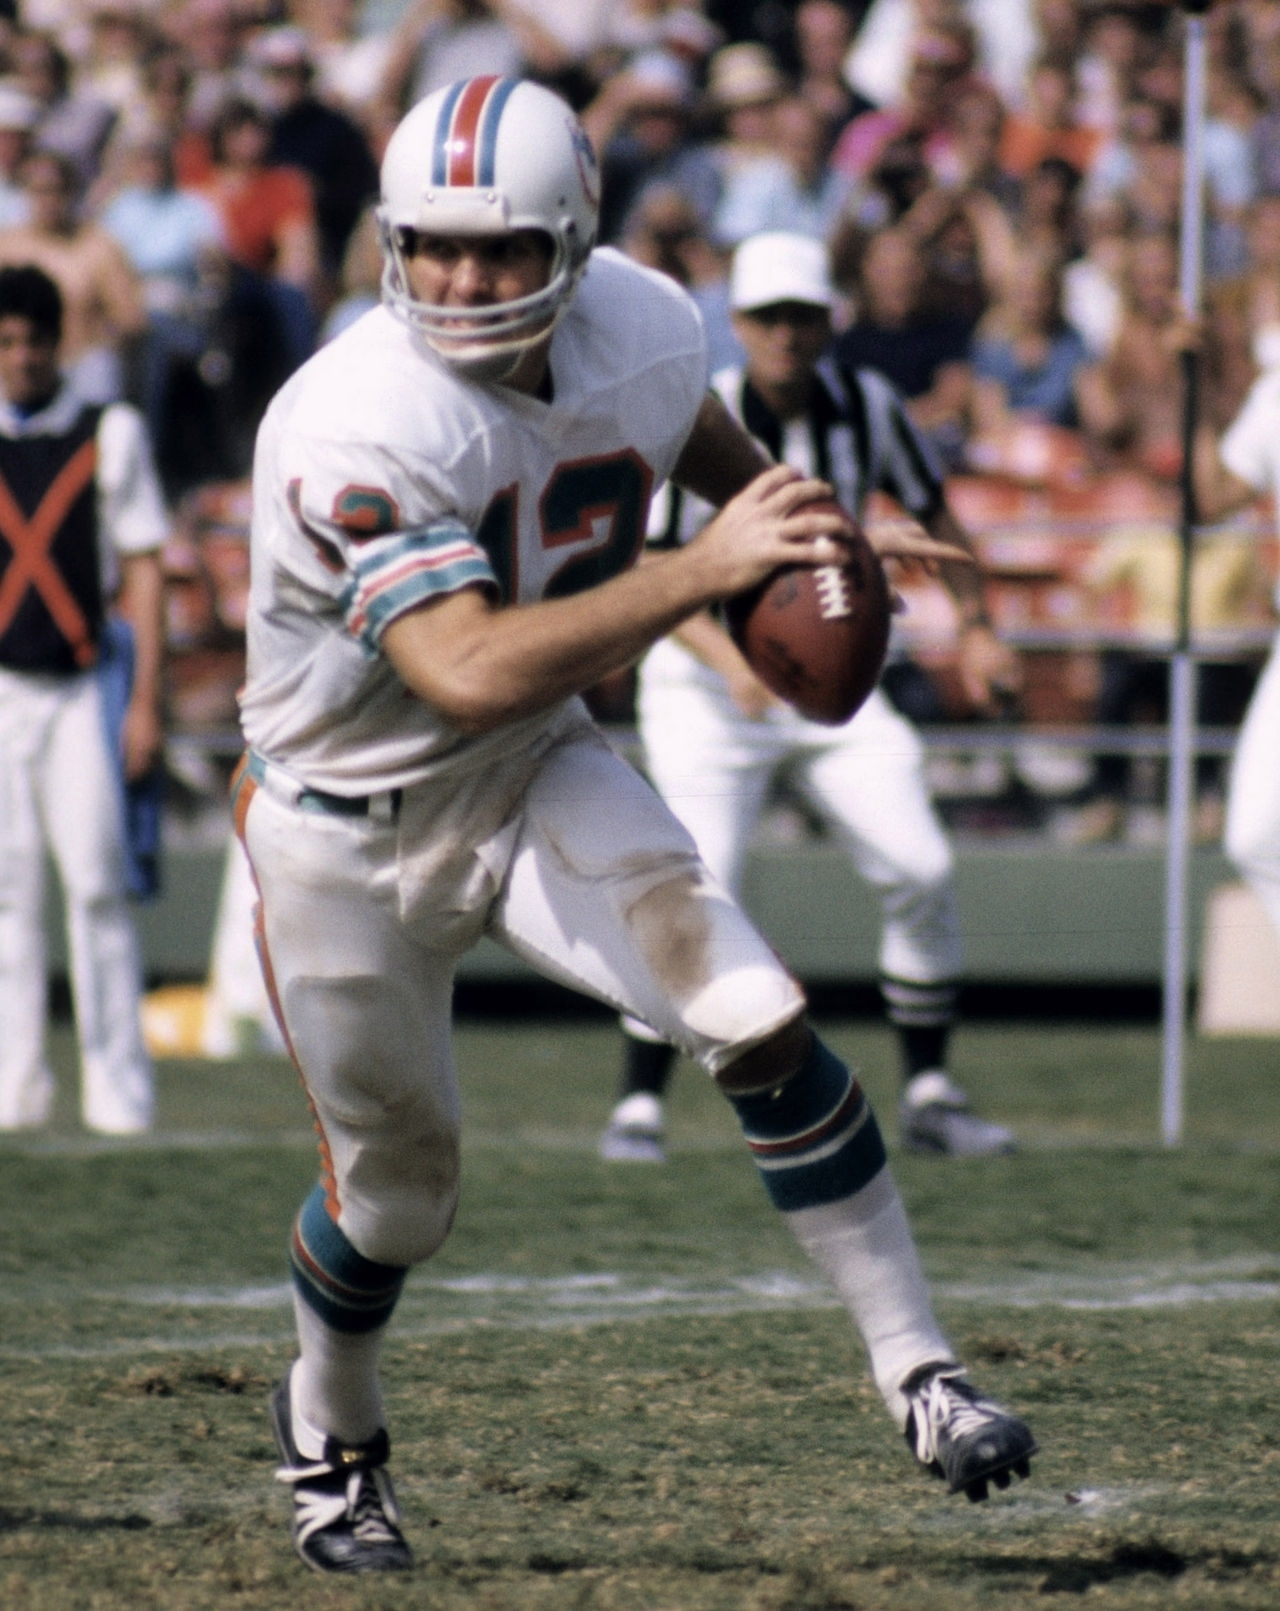 Mad Men - 1967 Hall Of Fame Nfl Draft Picks | Nfl regarding Miami Dolphins Super Bowl Appearances